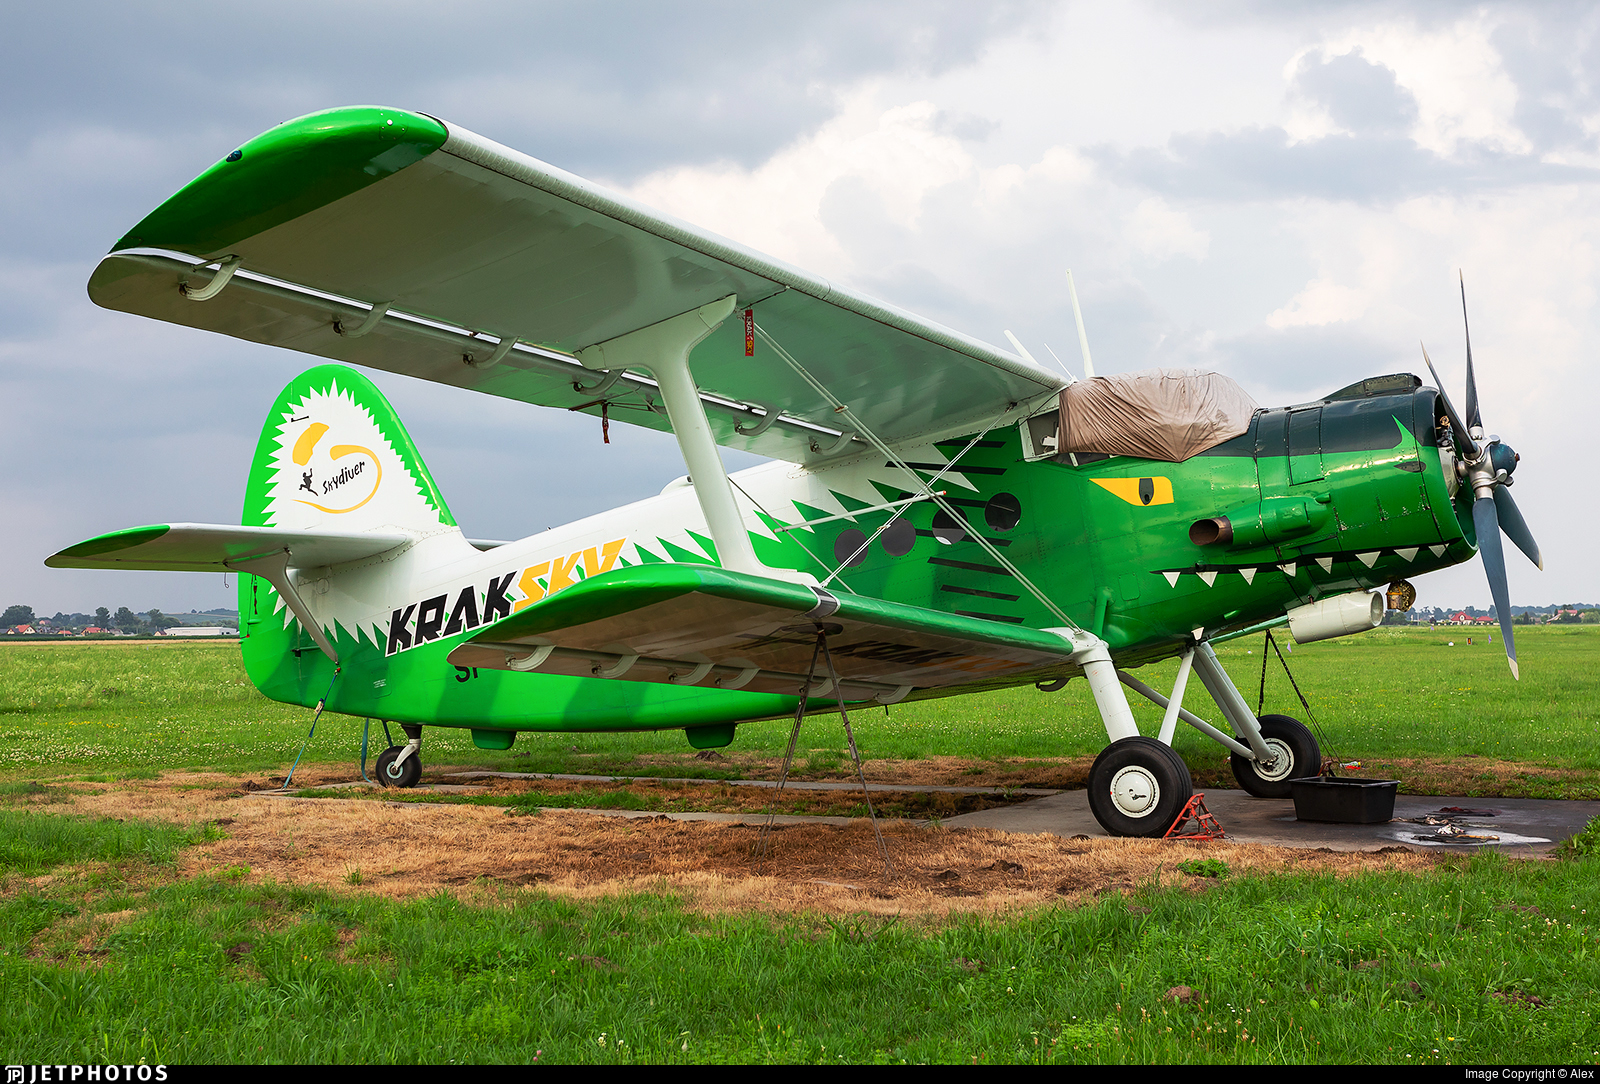 SP-AOF - PZL-Mielec An-2 - Kraksky